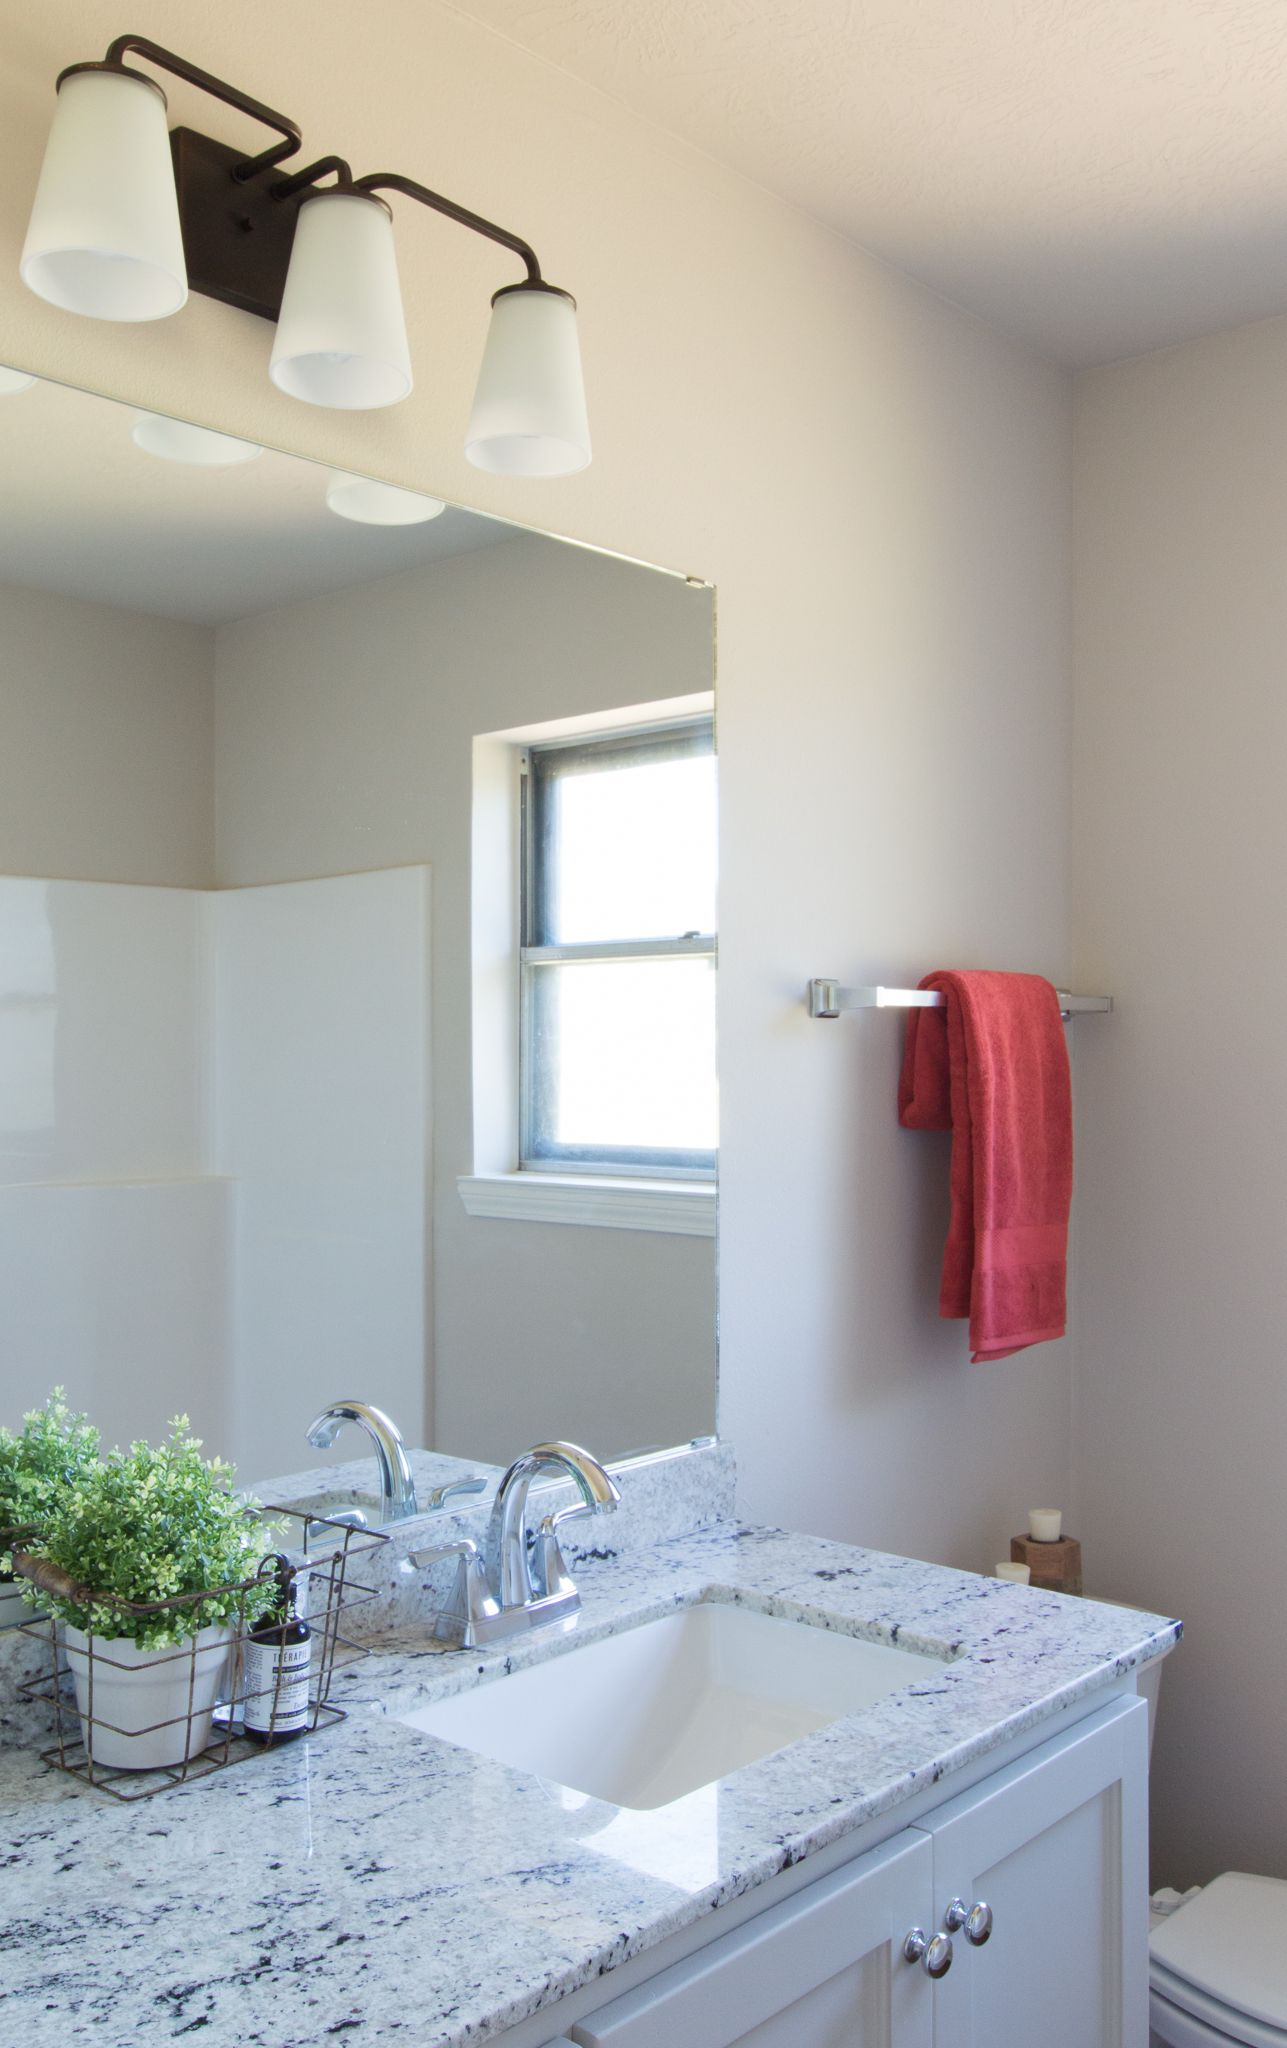 Modern Farmhouse Bath Chrome And Oil Rubbed Bronze Fixtures Jk